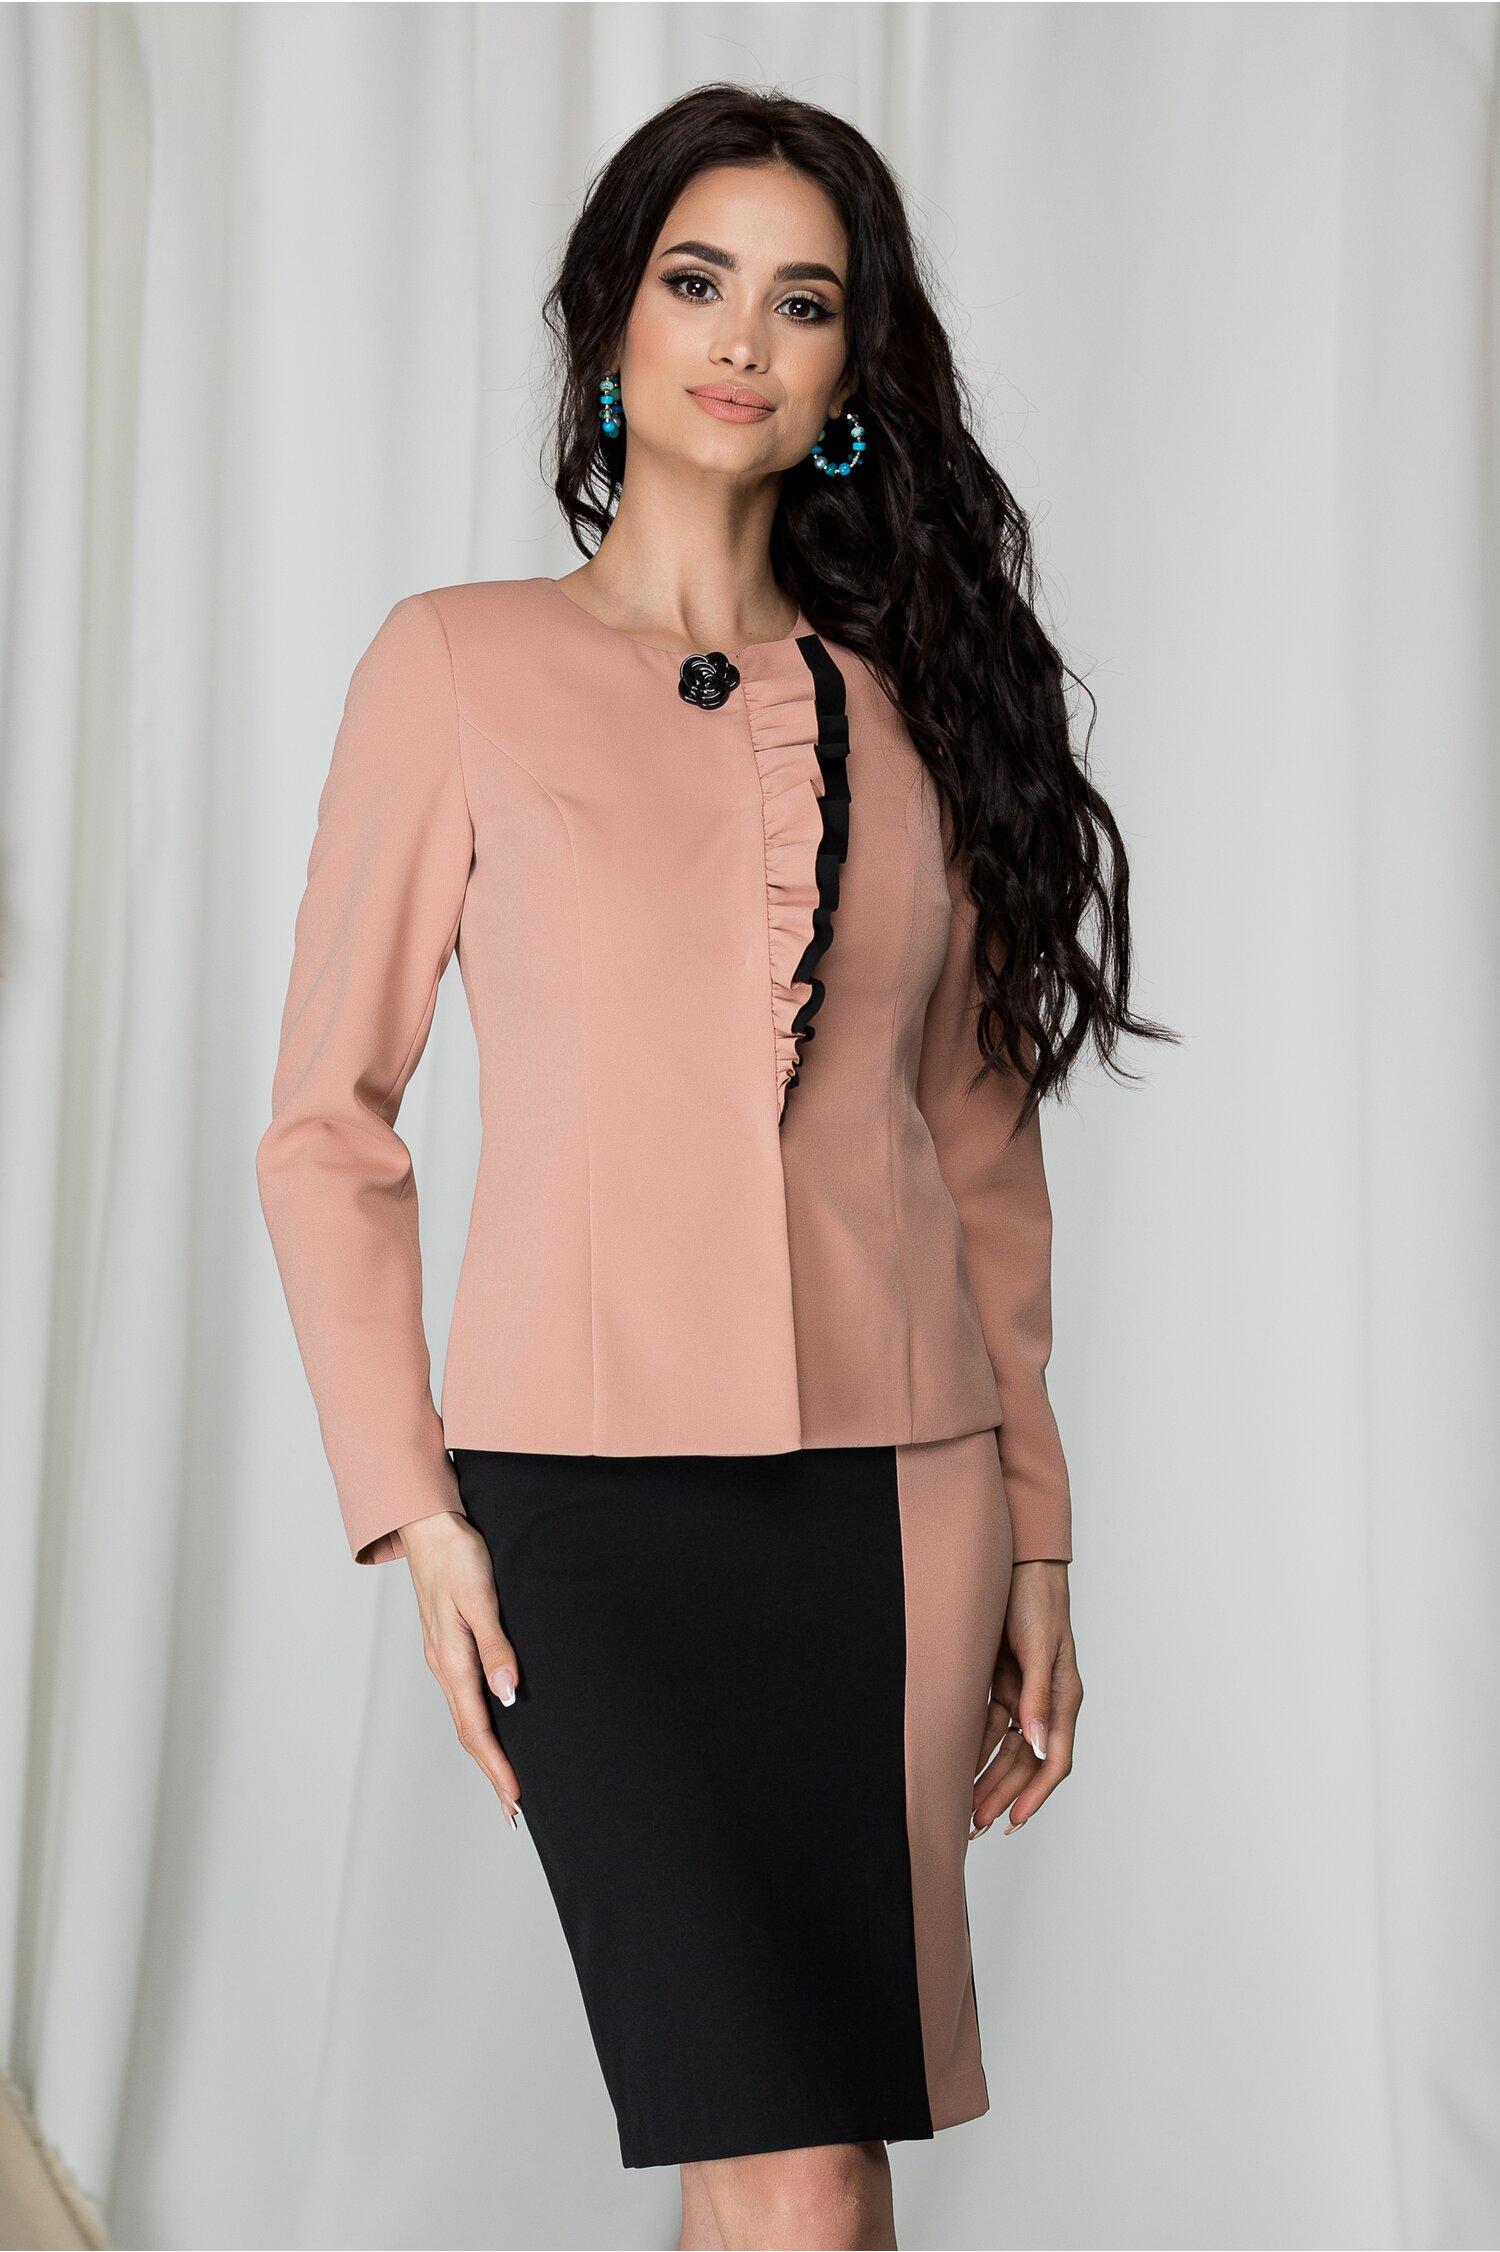 Compleu Leonard Collection cu sacou roz pudrat si rochie neagra